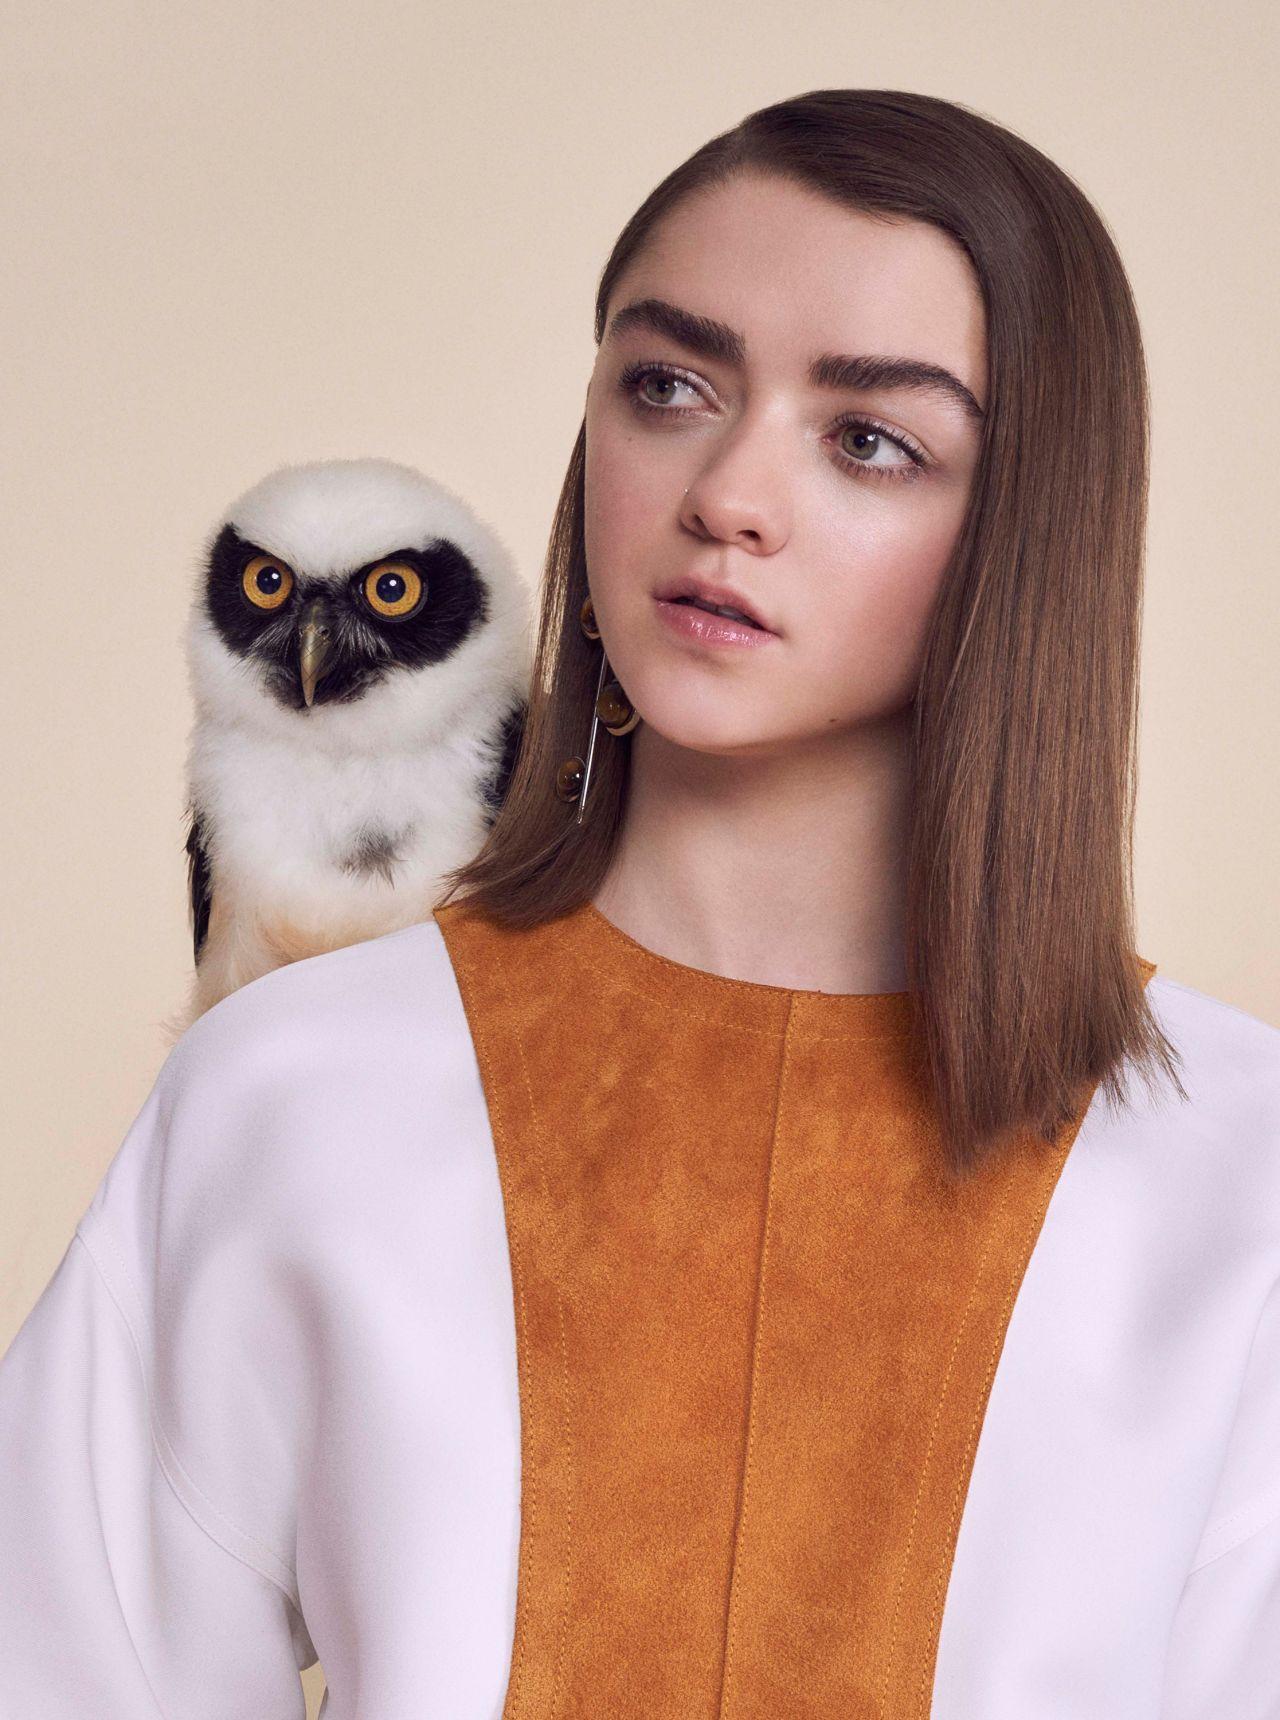 maisie williams photoshoot for instyle magazine uk april